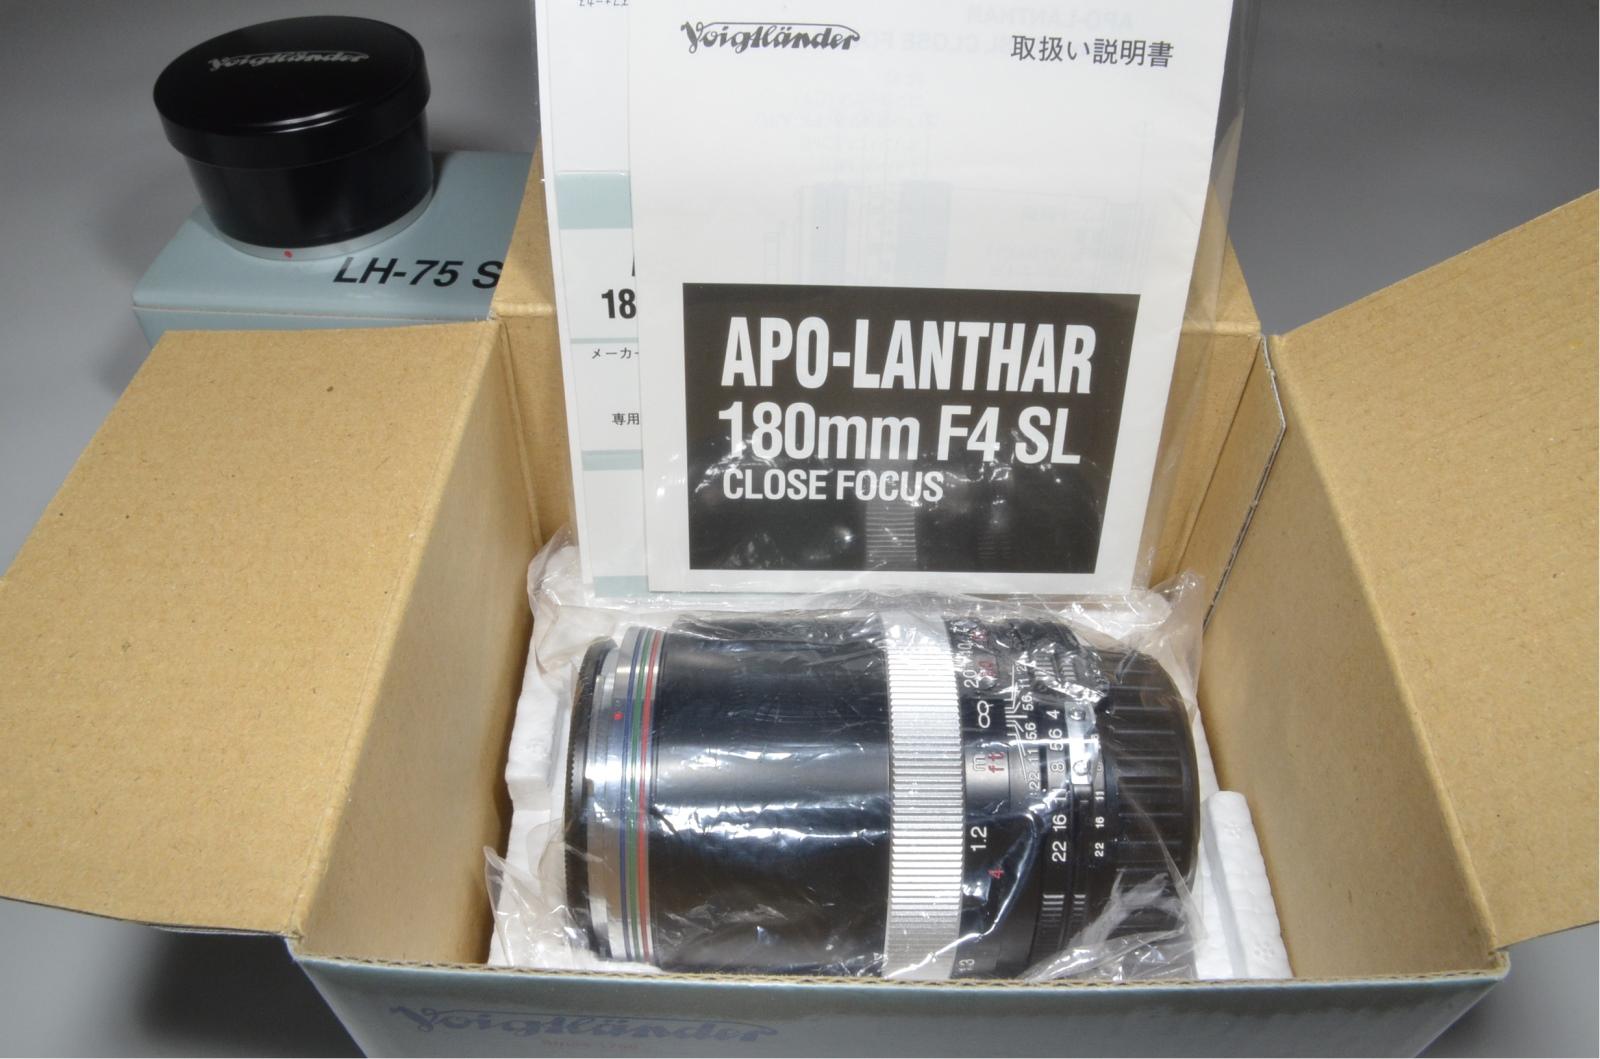 voigtlander apo-lanthar 180mm f4 sl for ai-s nikon with hood